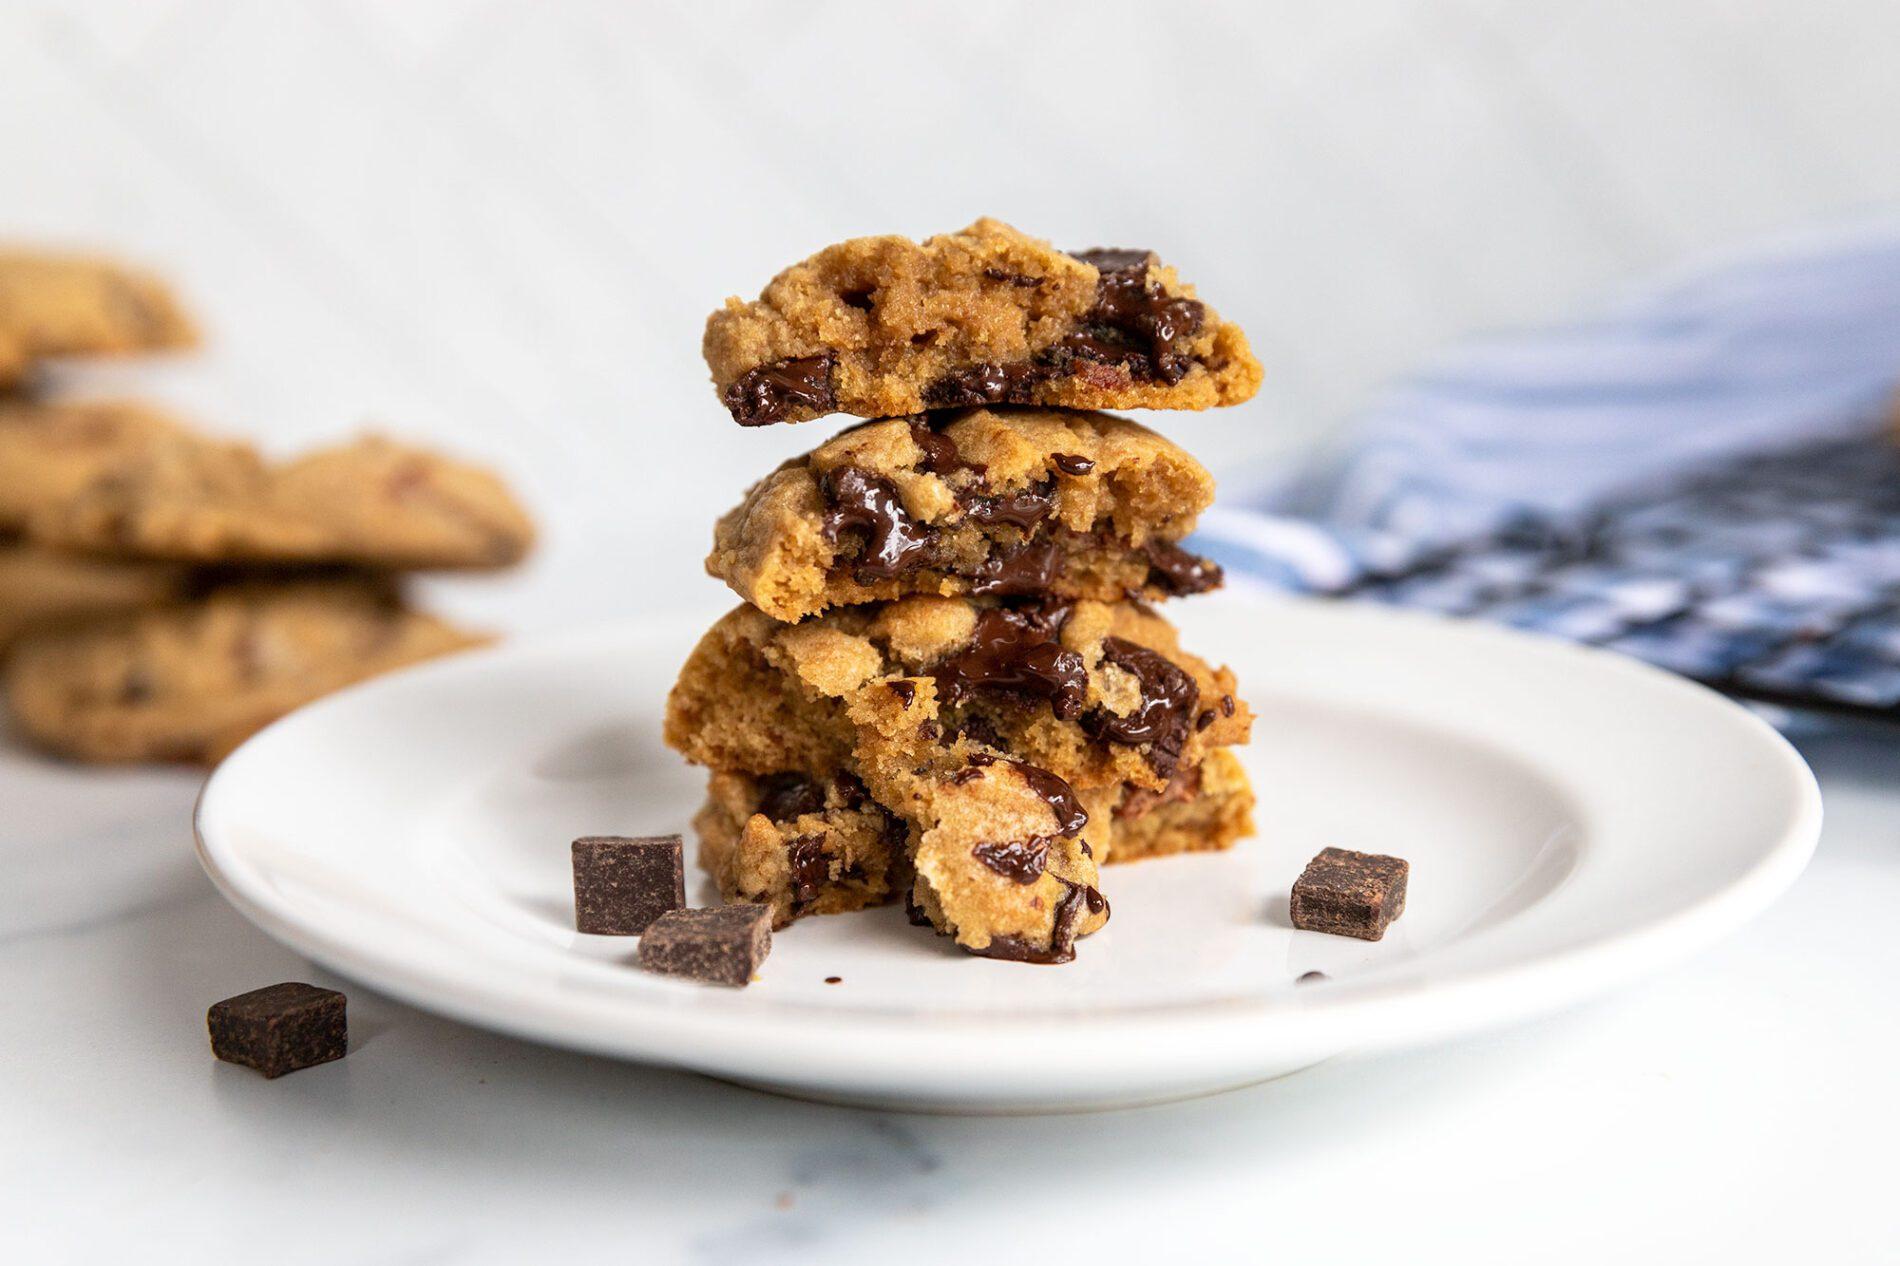 plate of gooey chocolate chunk cookies